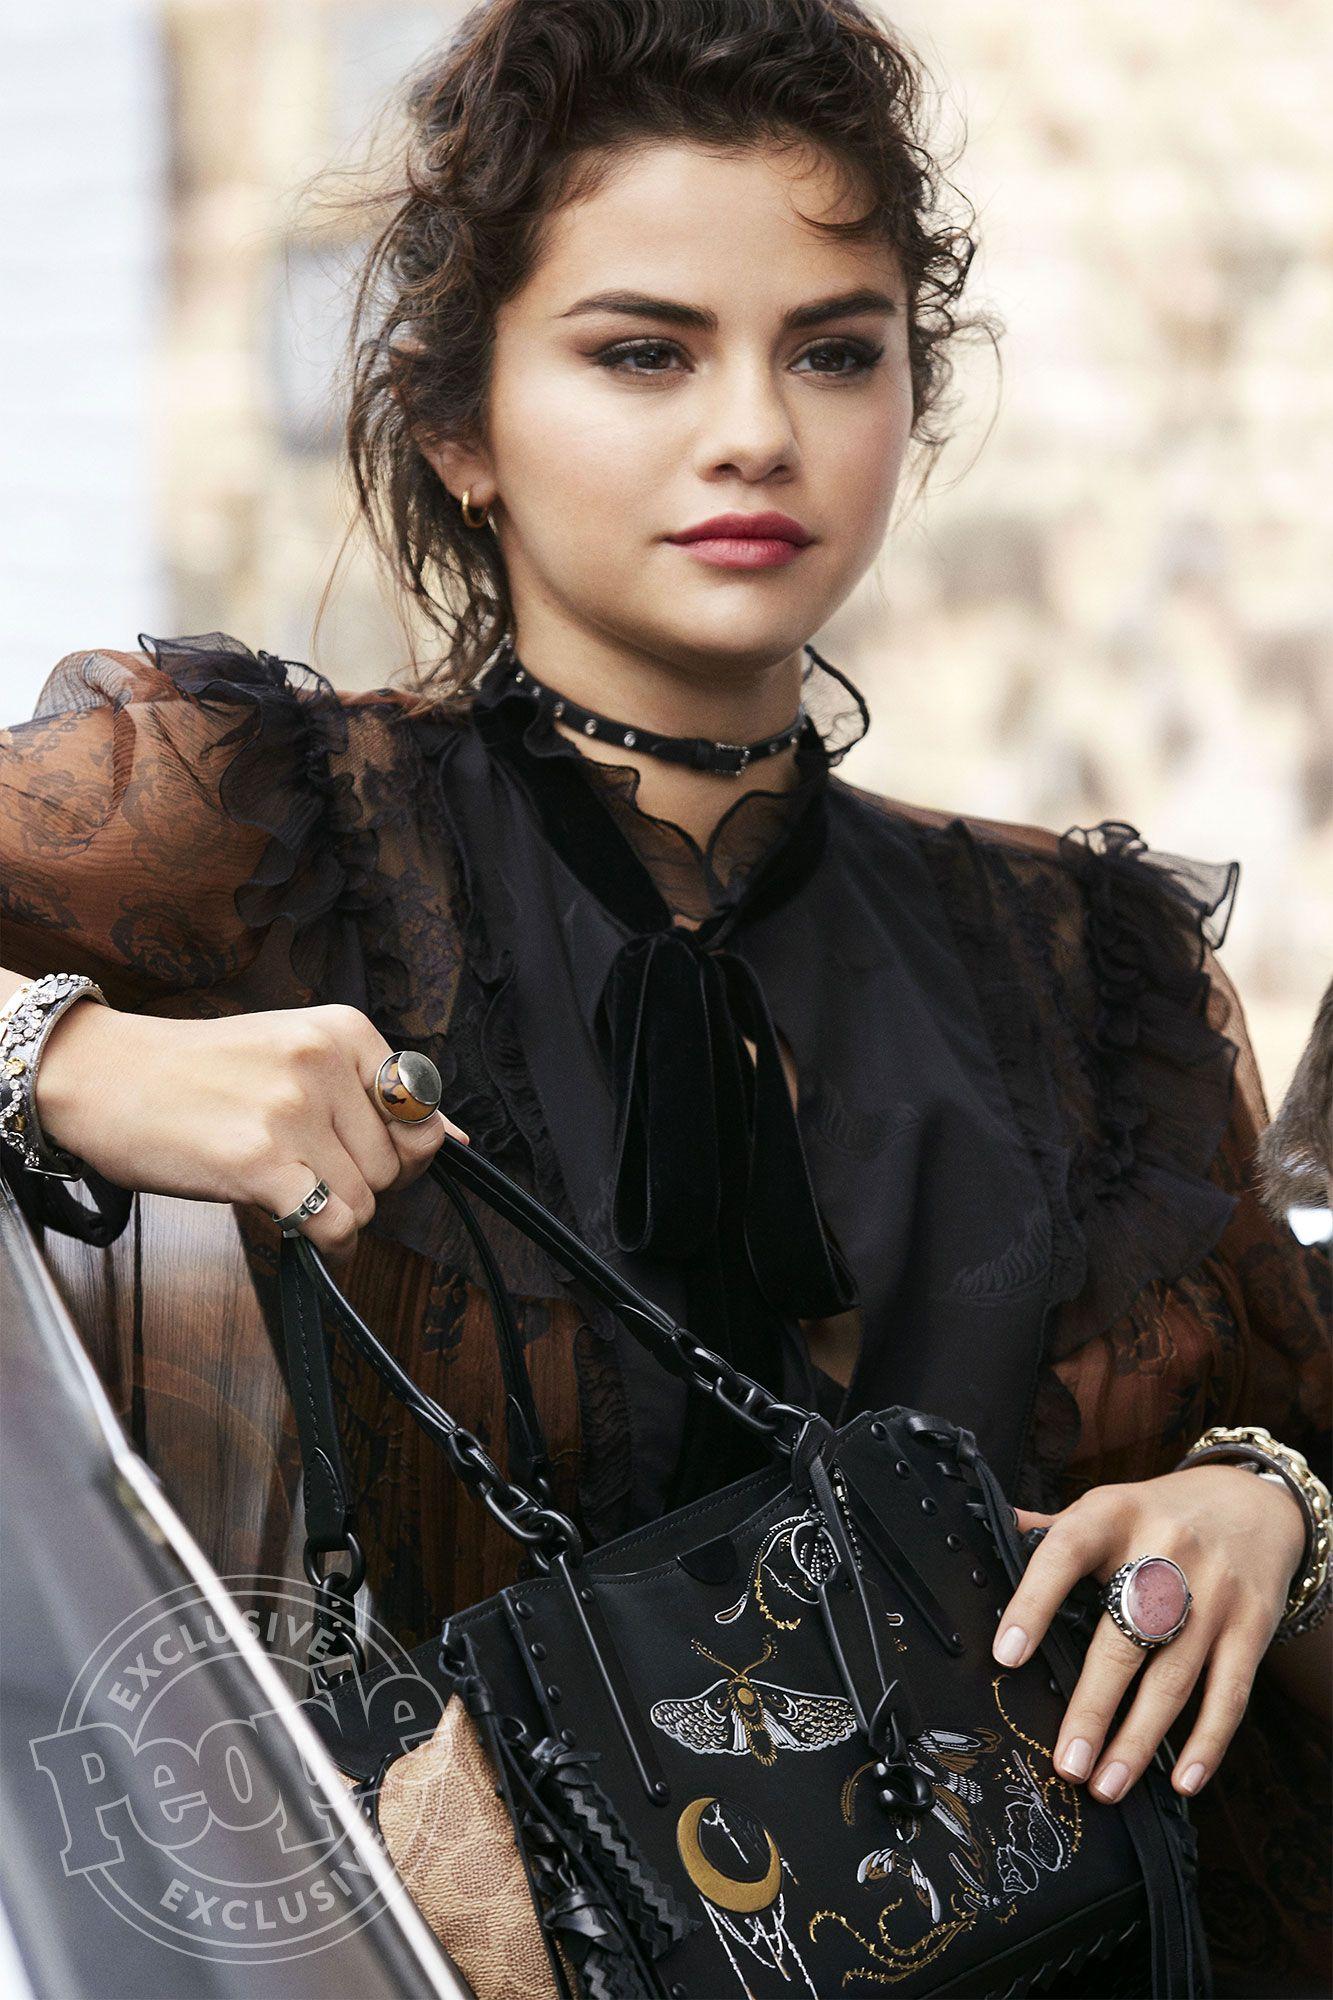 Go Behind the Scenes of Selena Gomezs Latest Coach Campaign